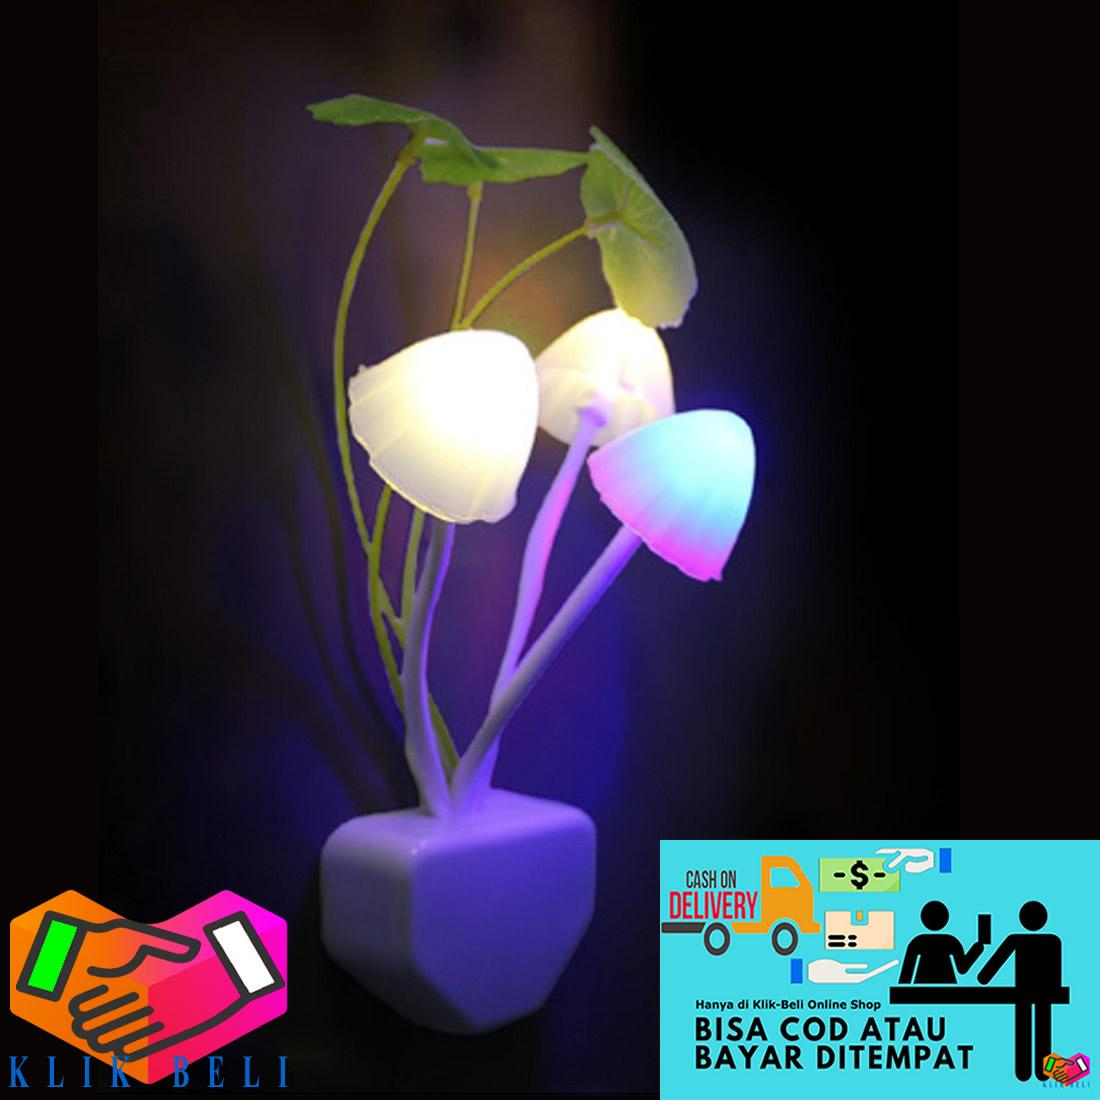 Klik-Beli Lampu Tidur Jamur Sensor Cahaya LED Avatar Hias Kamar